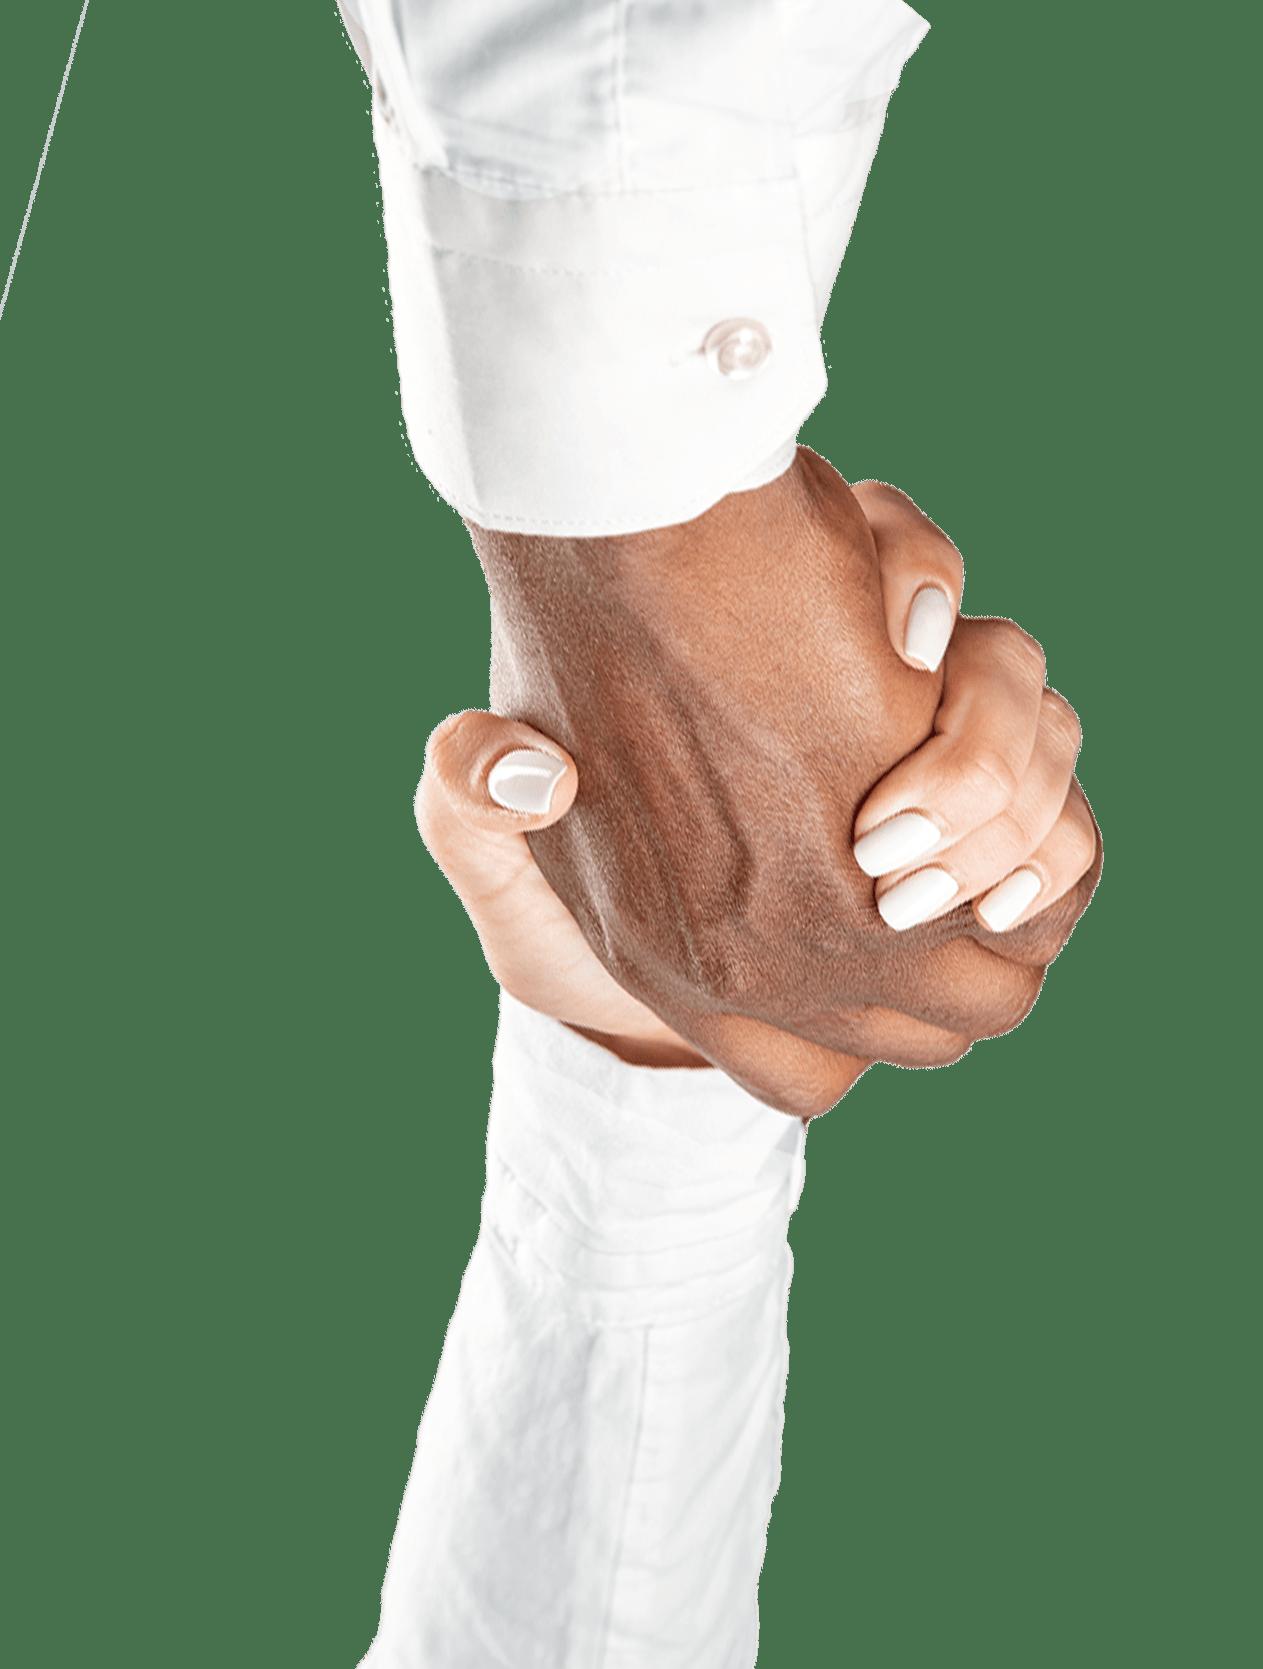 Healthcare Partnerships